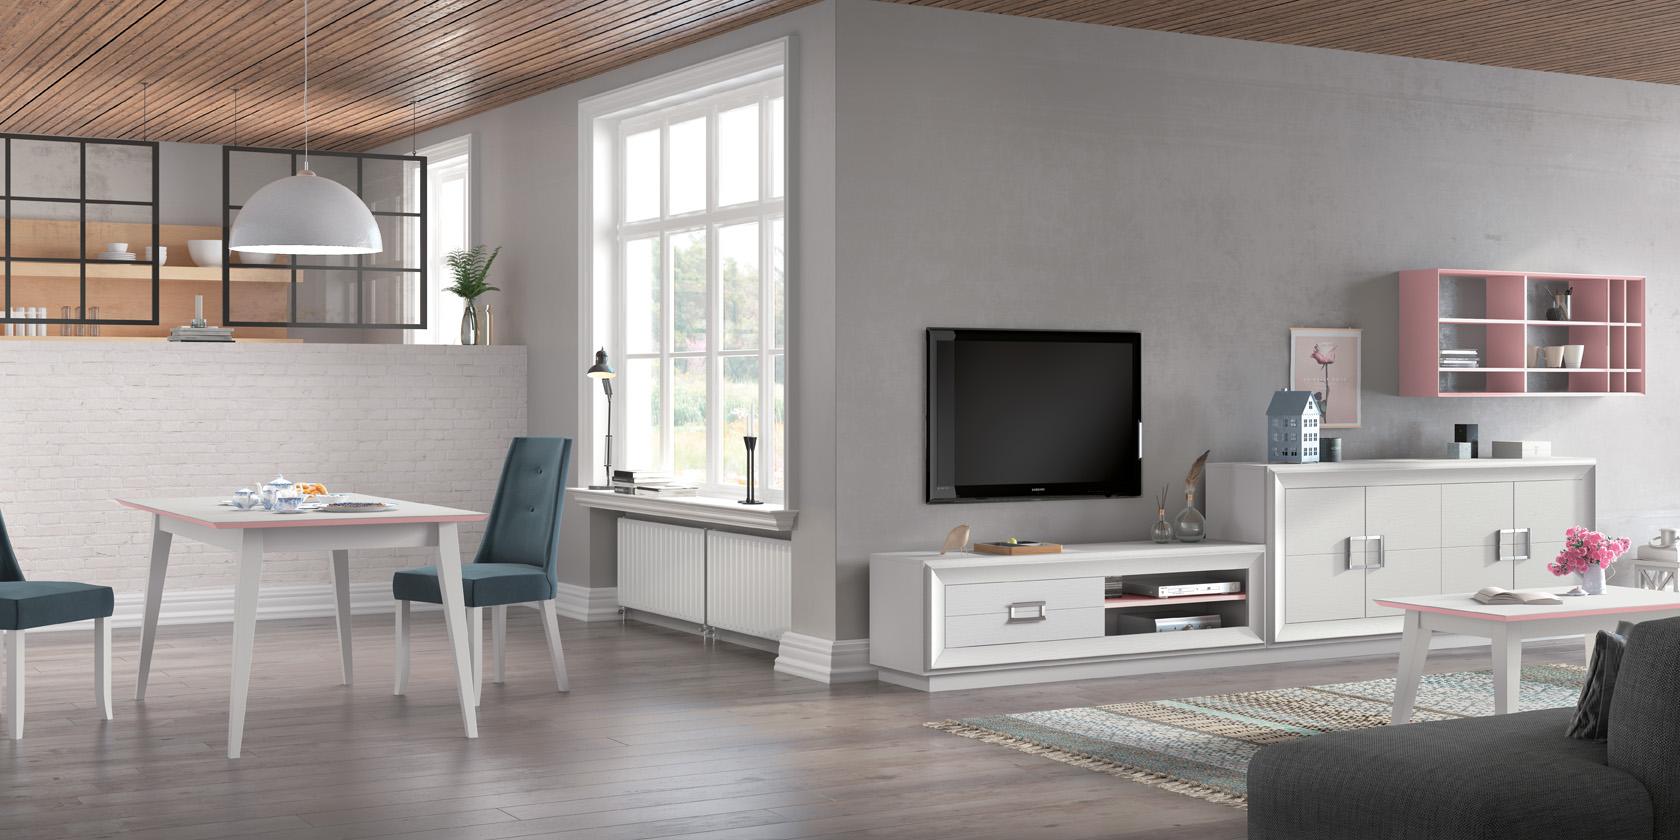 salon-contemporaneo-L-GANT-muebles-paco-caballero-724-5cc6bd7e9ede0